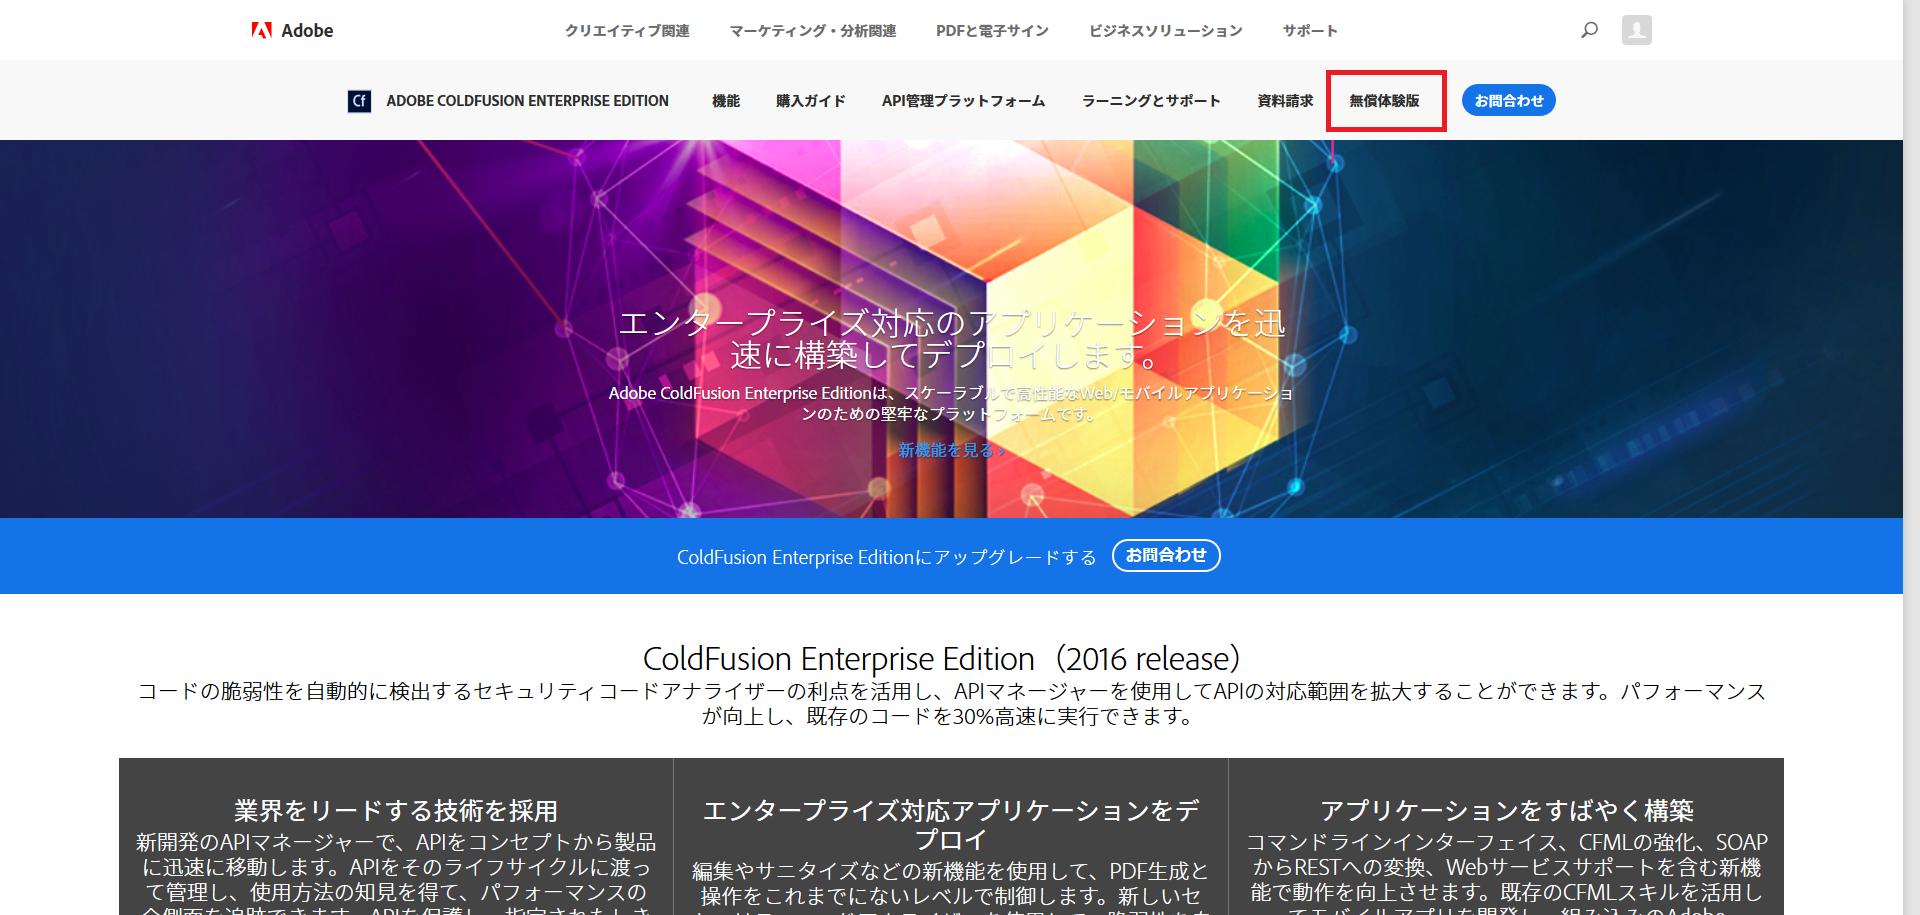 Screenshot-2018-3-6 Adobe ColdFusion Enterprise Edition.png